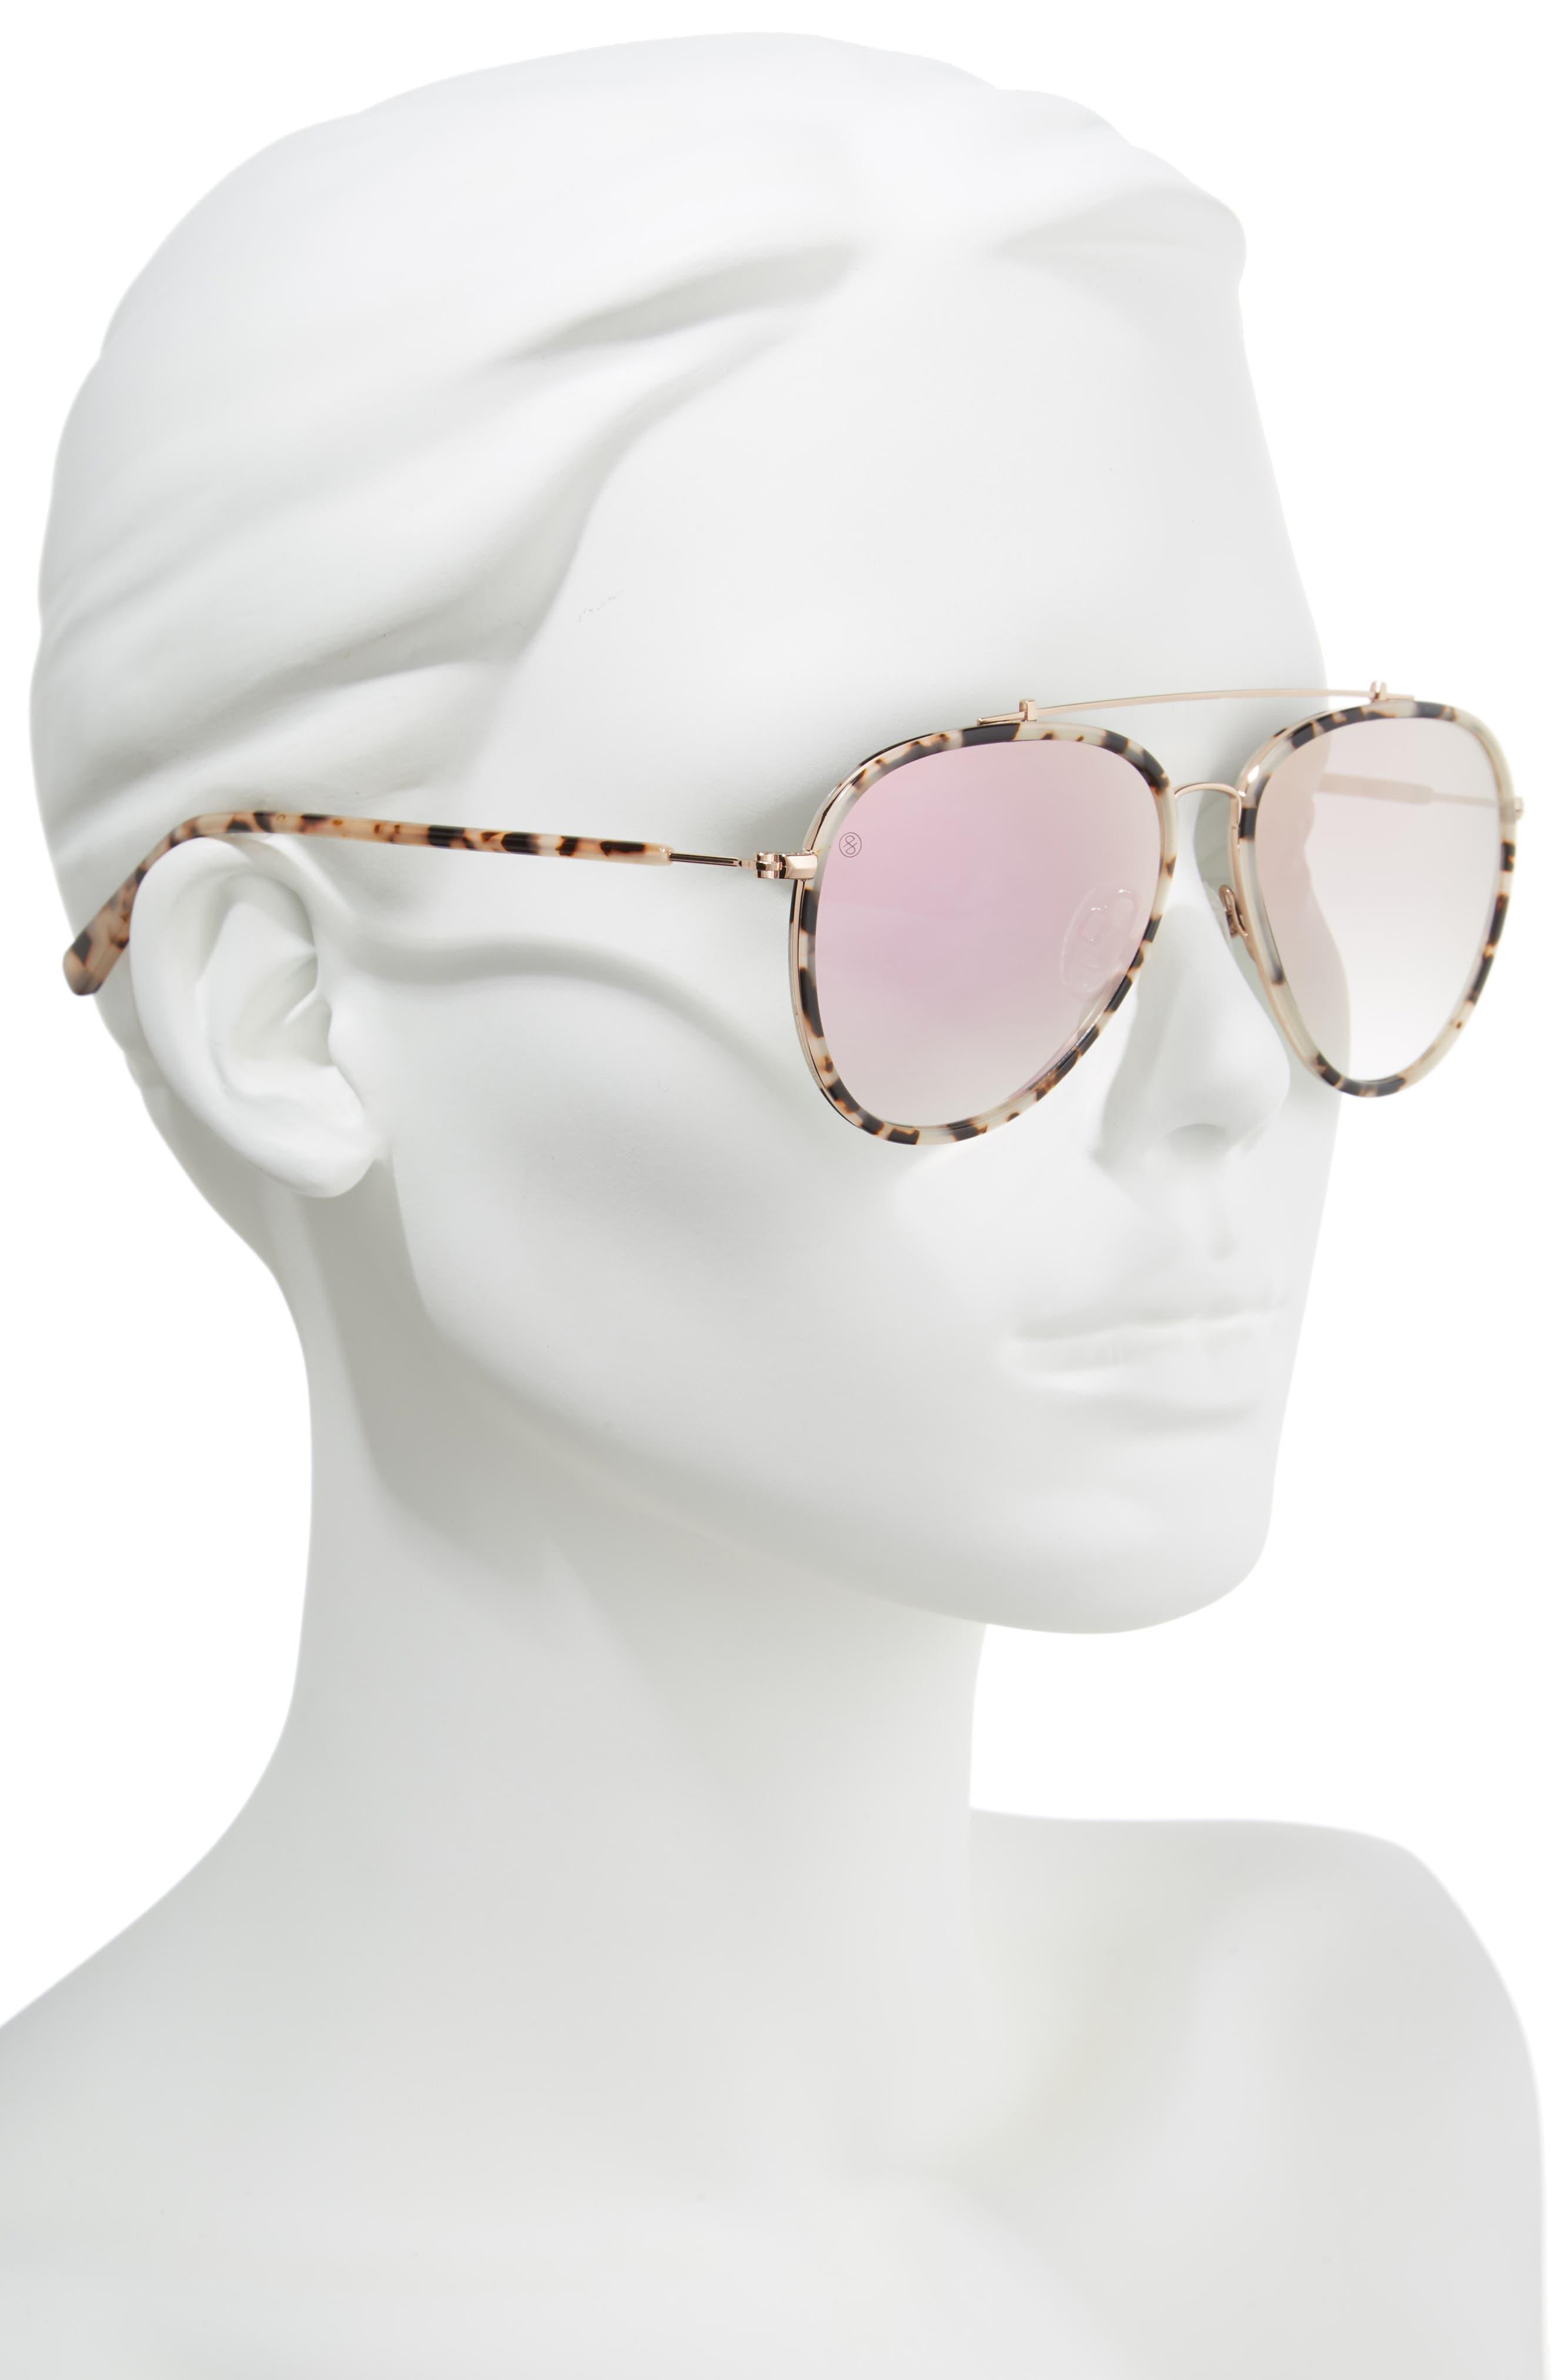 D'BLANC The Last 57mm Aviator Sunglasses,                             Alternate thumbnail 2, color,                             Snow Leopard/ Rose Flash